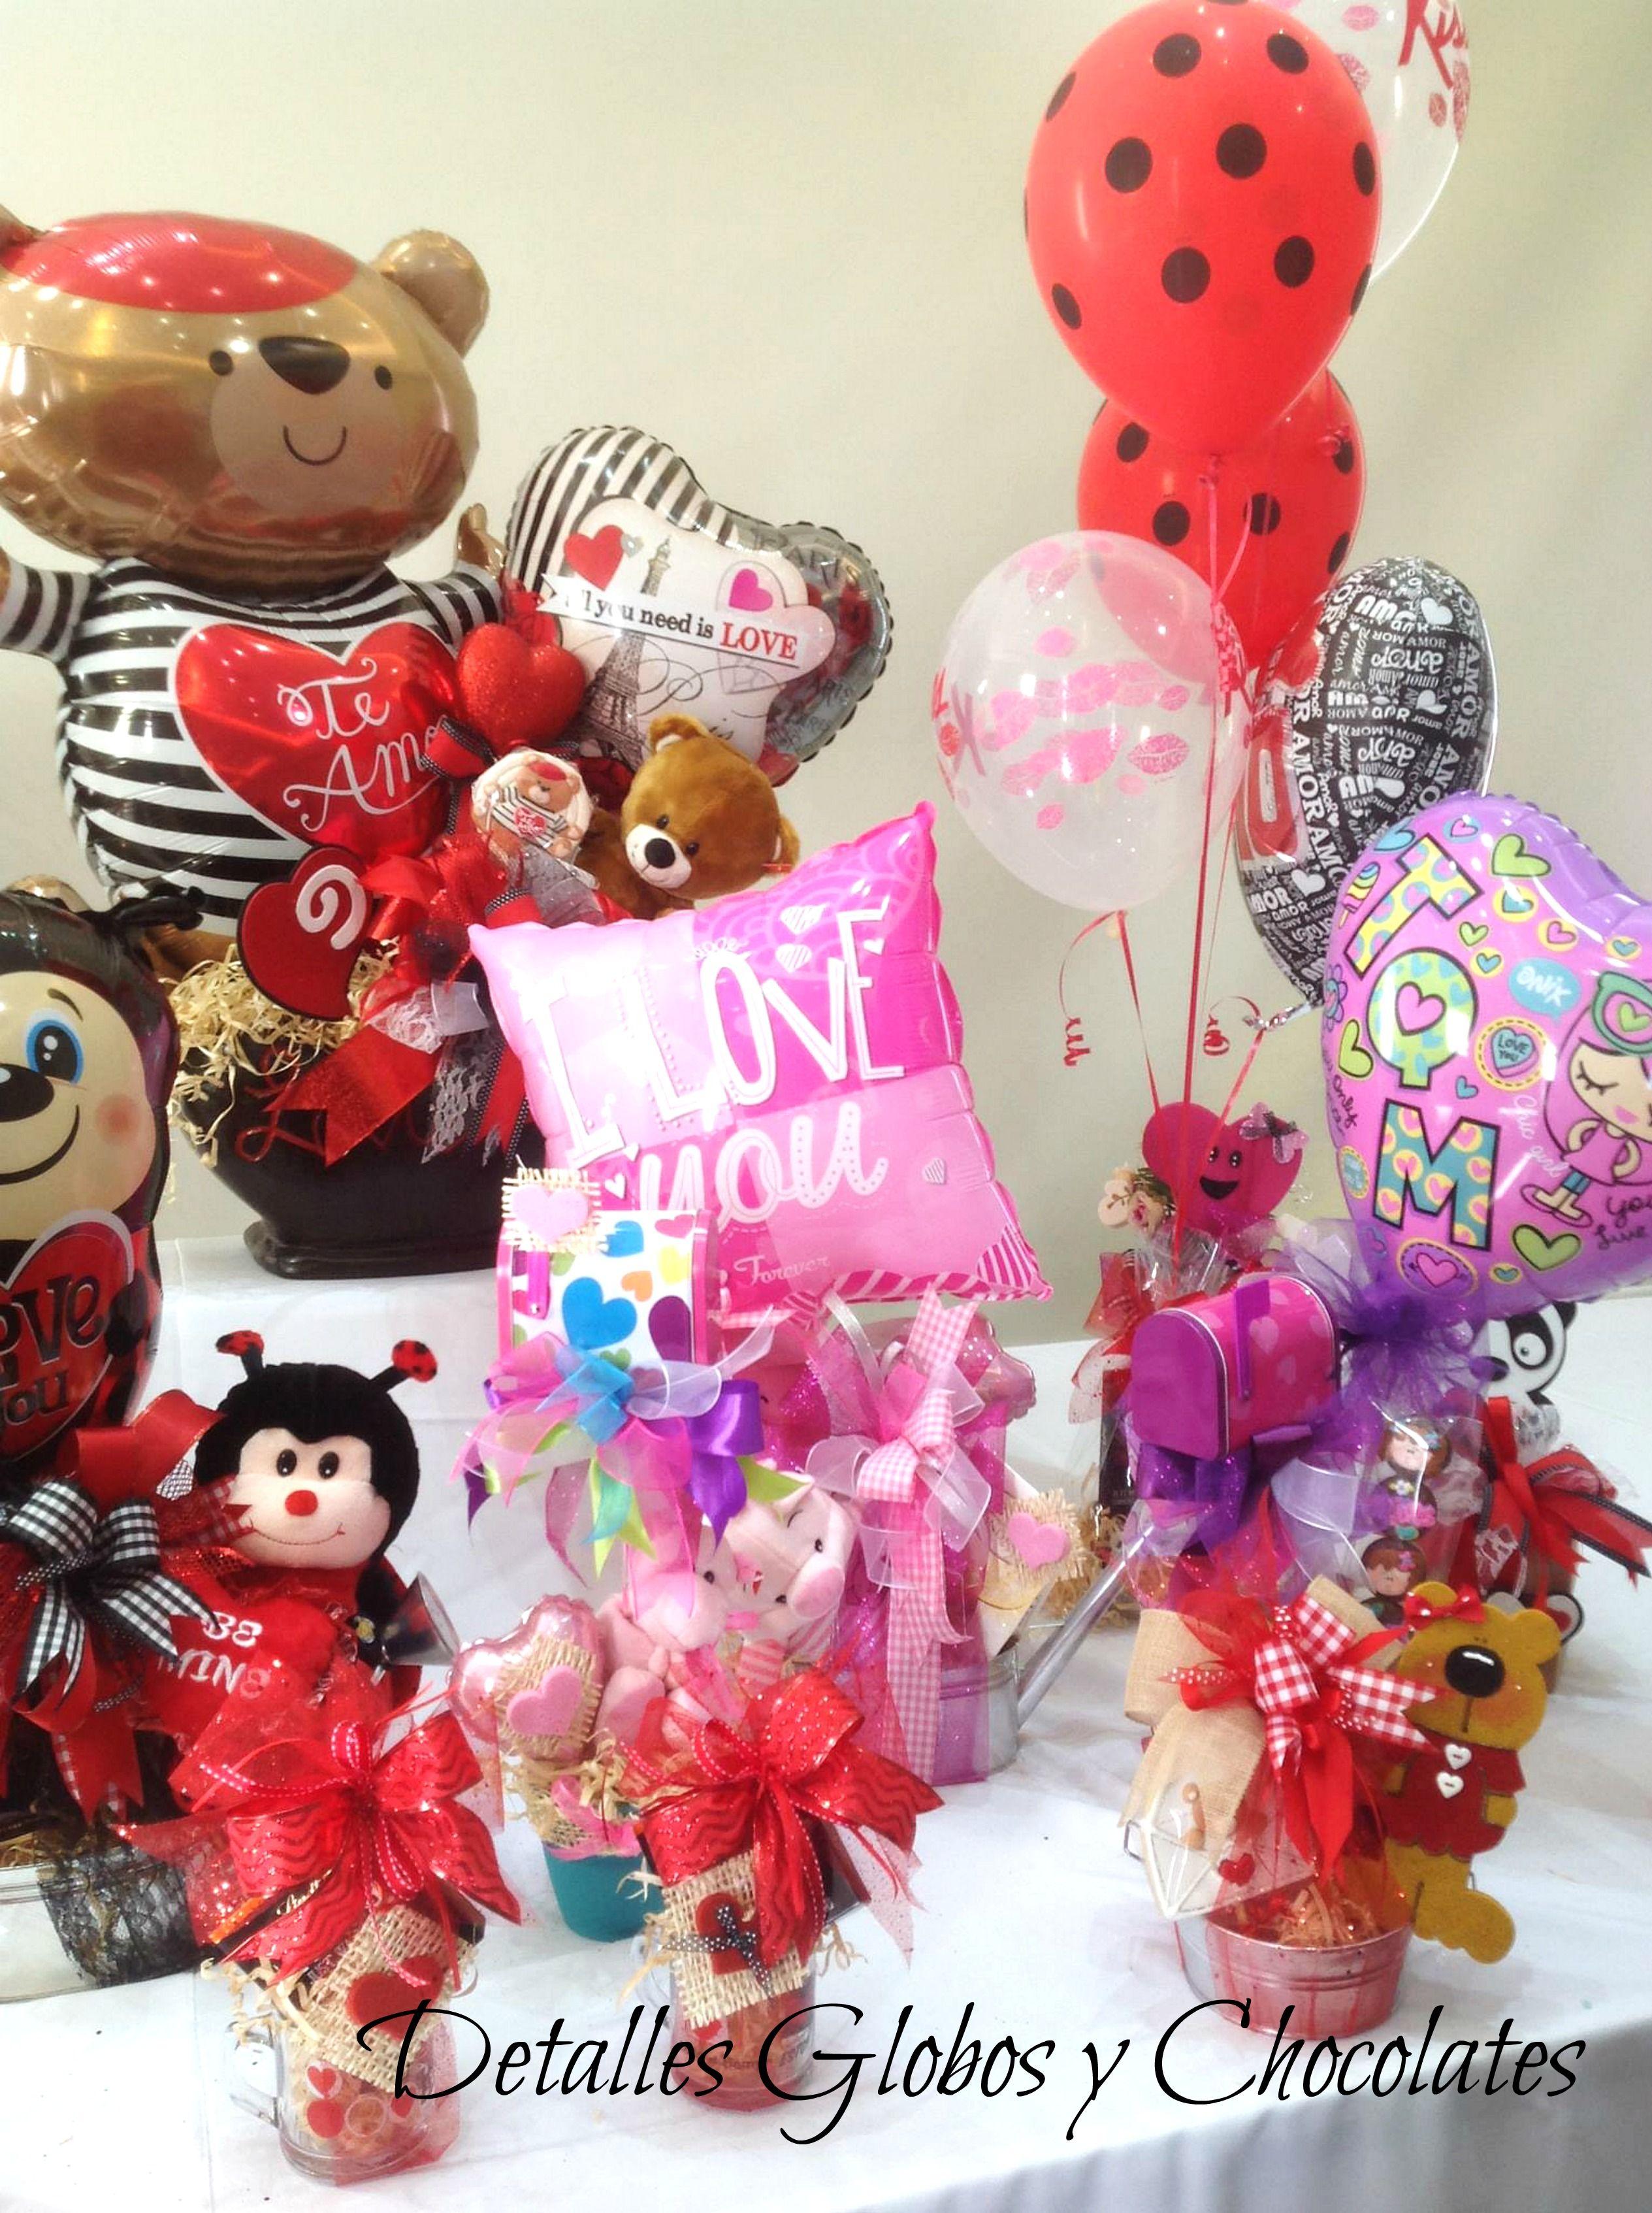 Detalles globos y chocolates decopeluches pinterest - Detalles para decorar ...